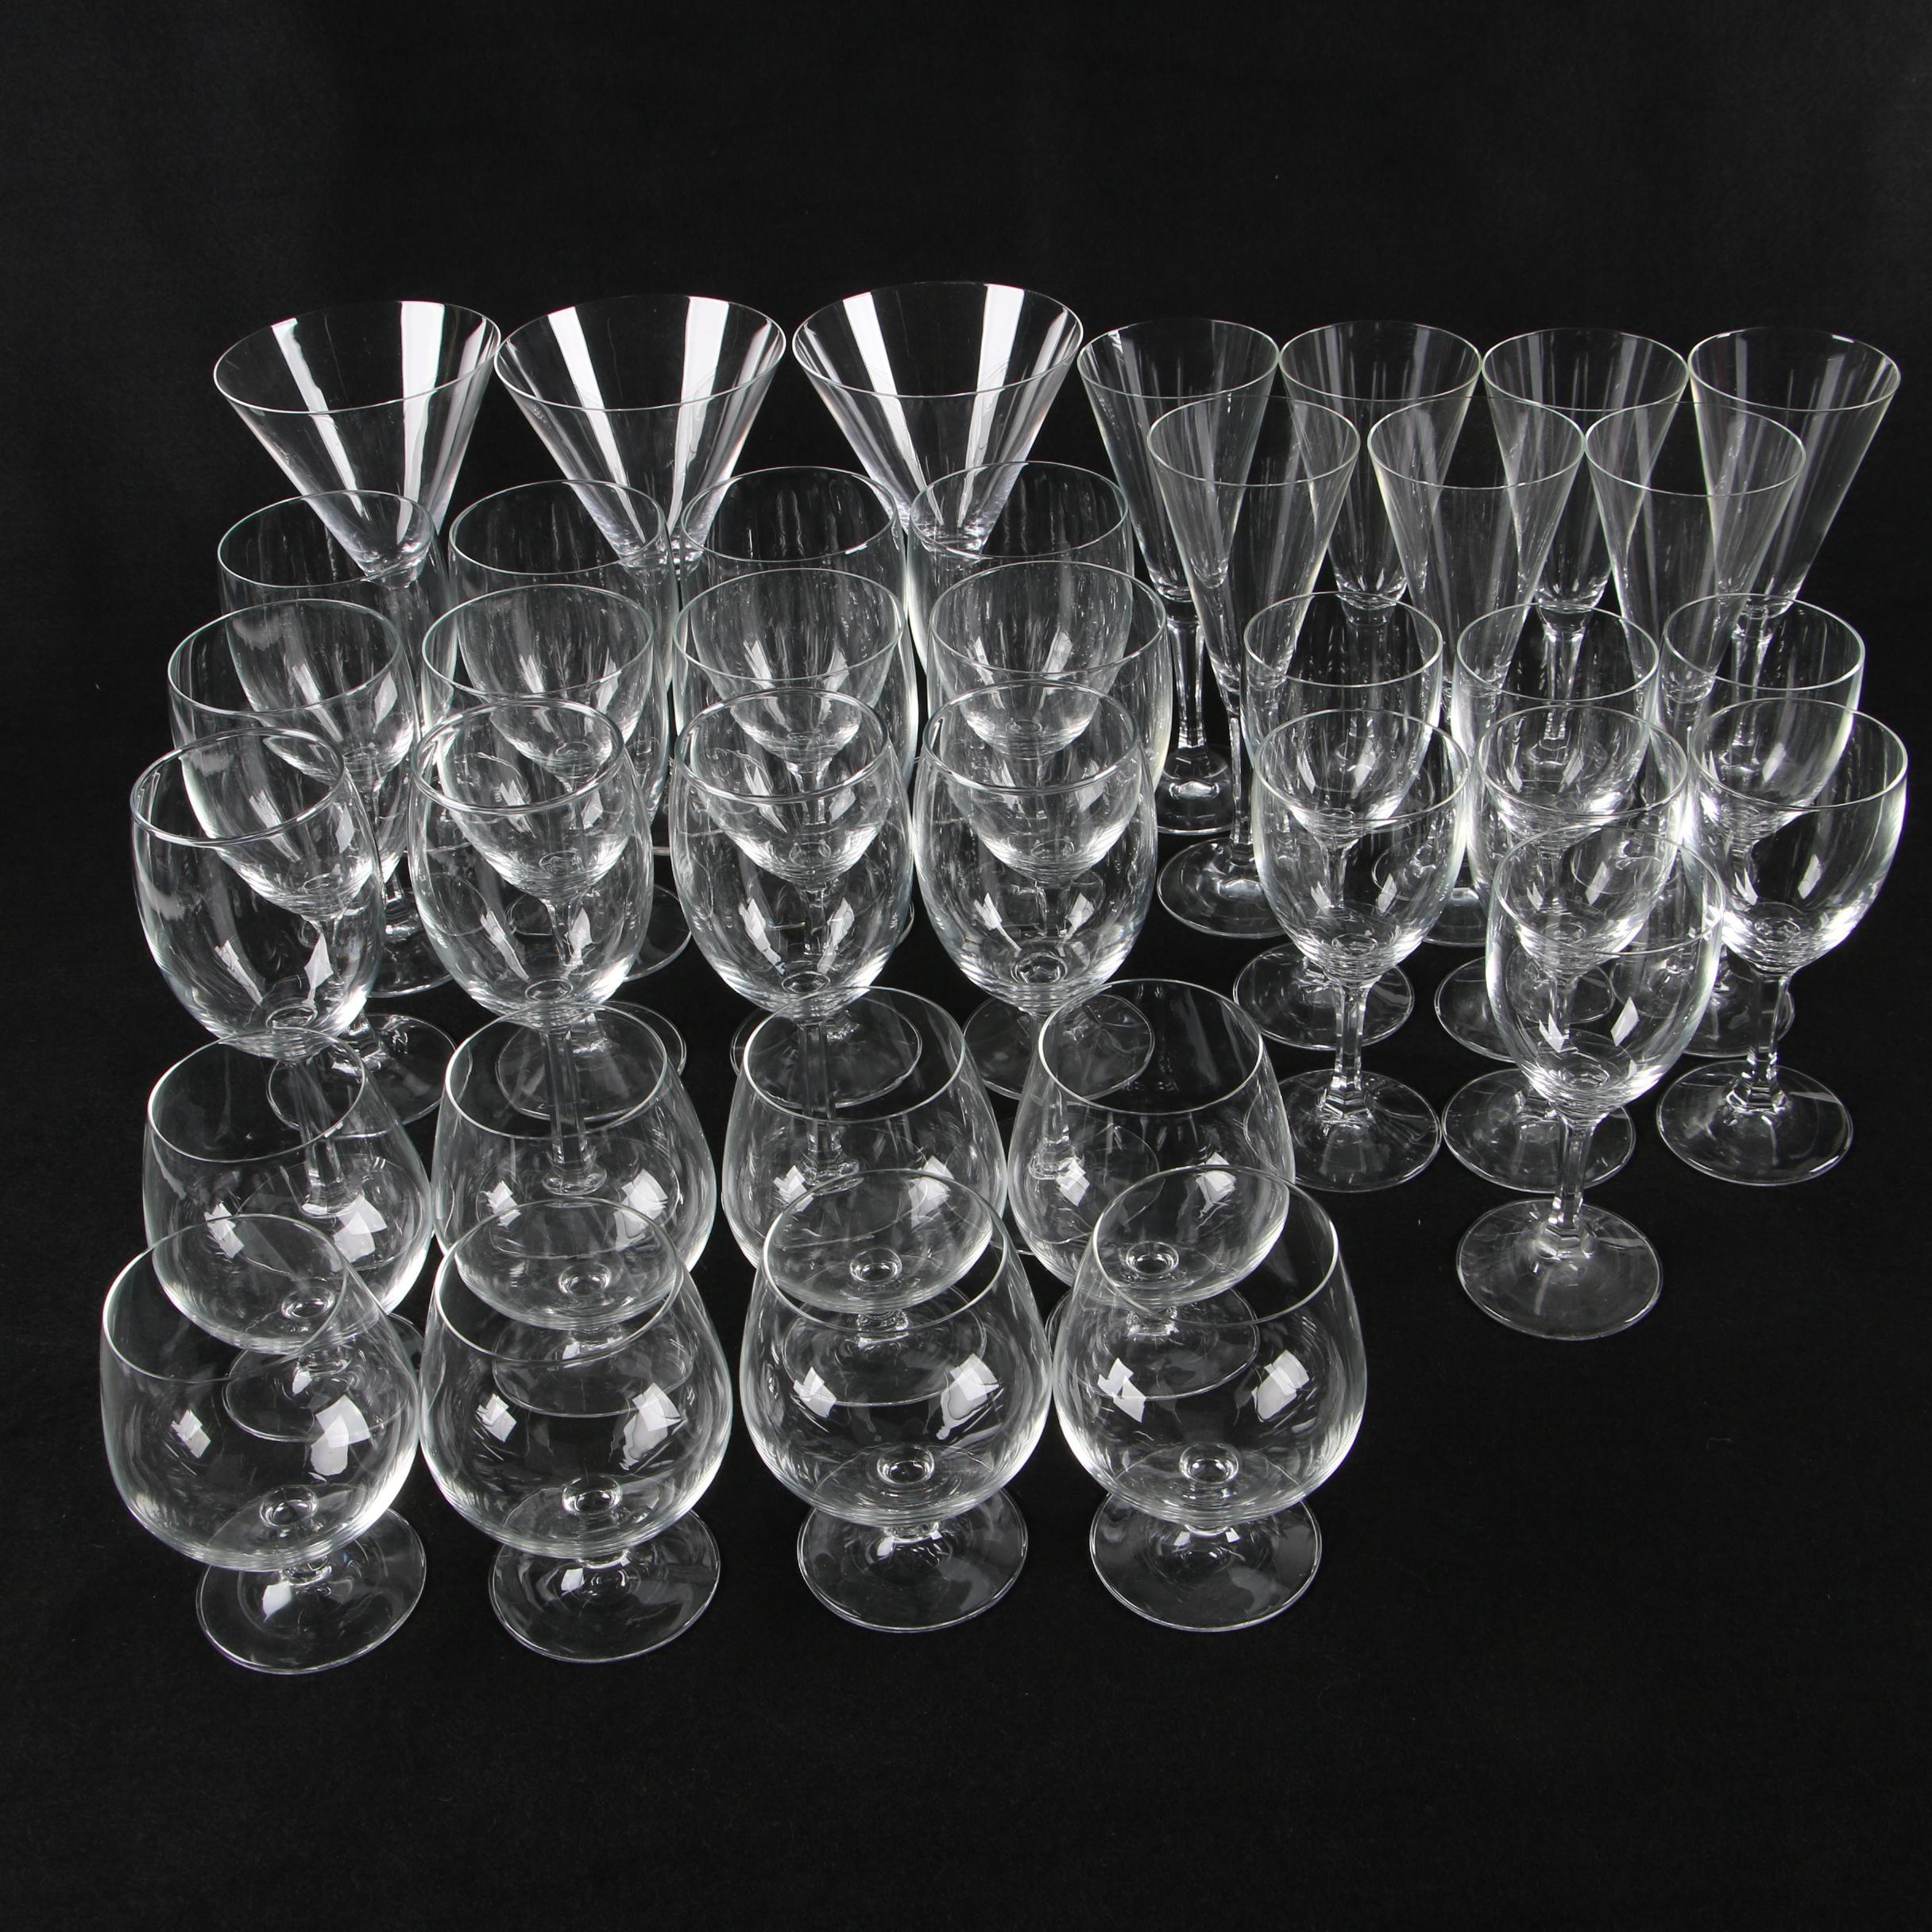 Pressed Glass Stemware Collection